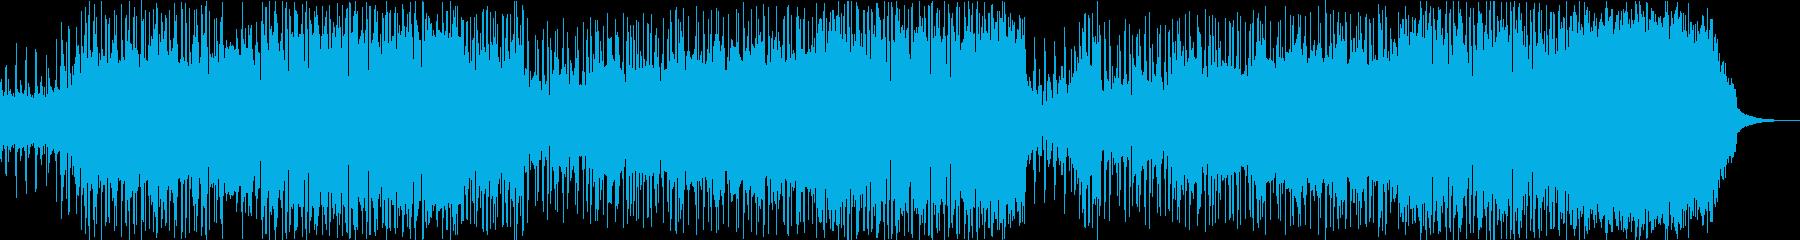 Gentle and nimble guitar POP's reproduced waveform